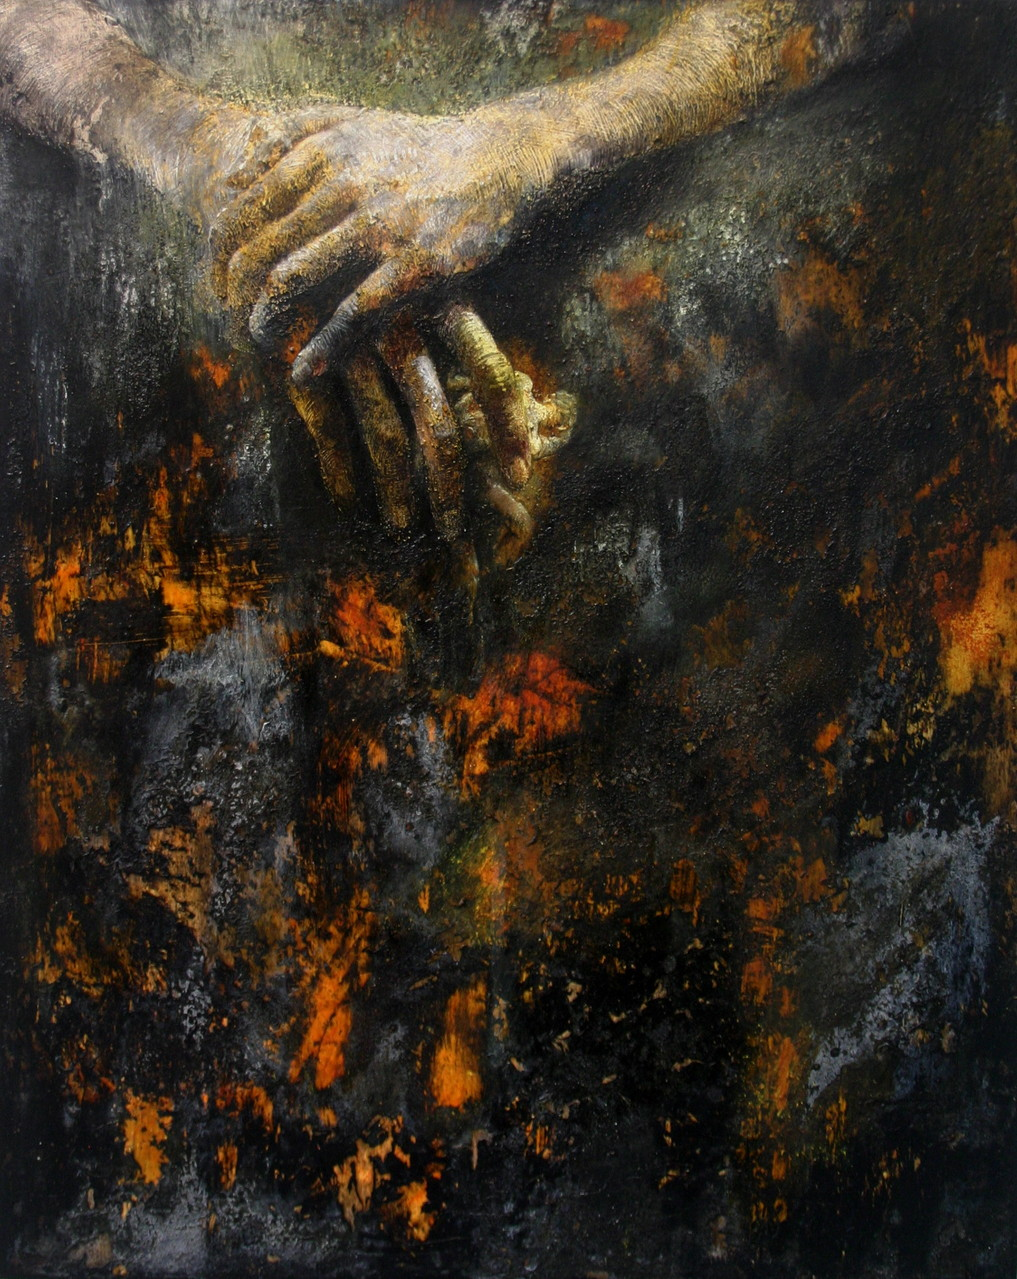 Have mercy on my soul - 2014, 50x40, olio su tavola.